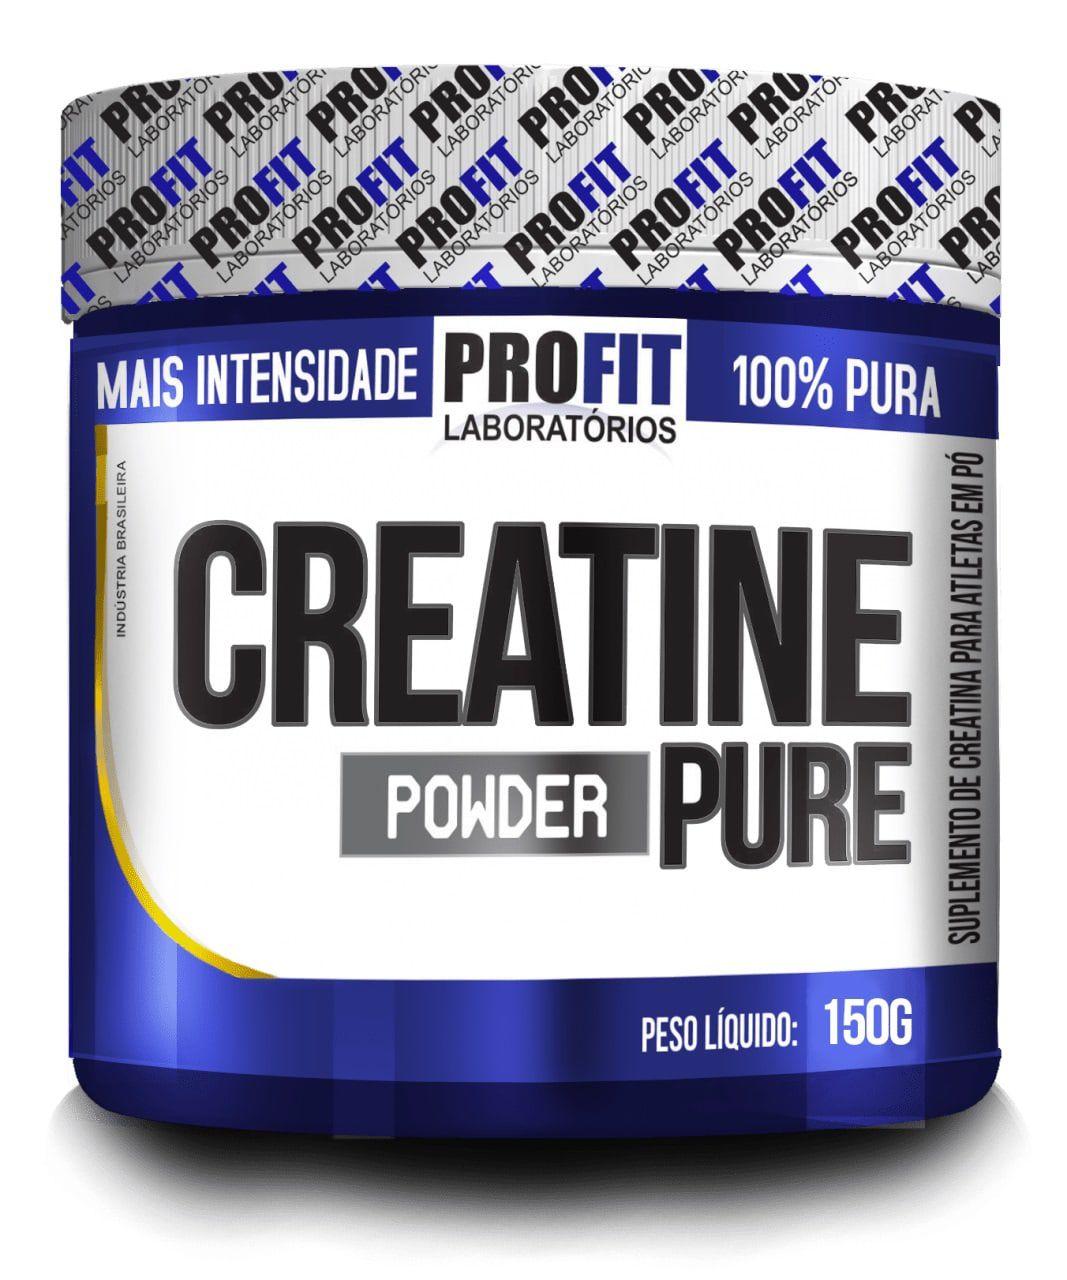 Creatina Powder Pure Profit - 150g